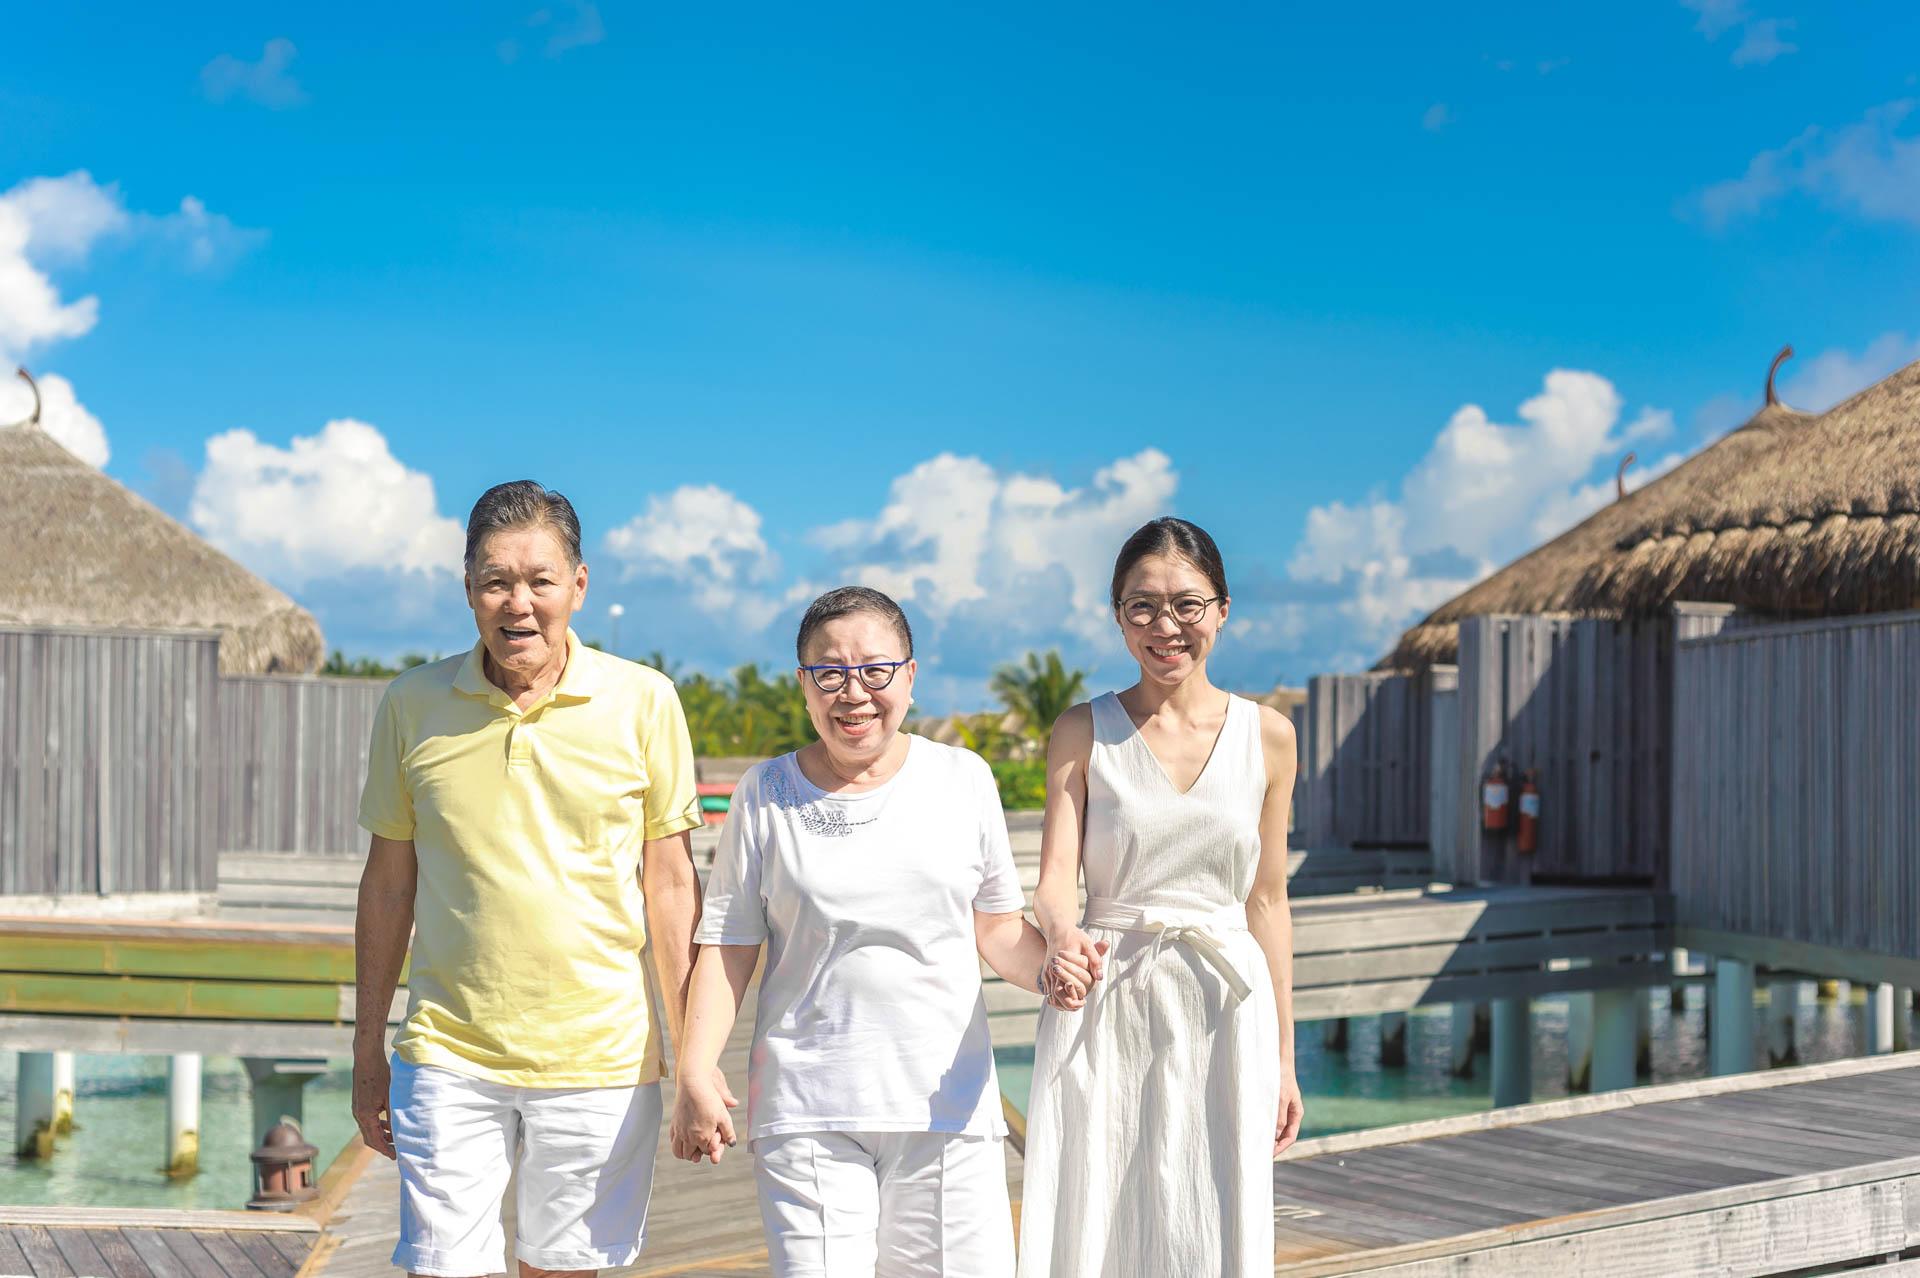 Jos Extended Family at Constance Moofushi Maldives 25